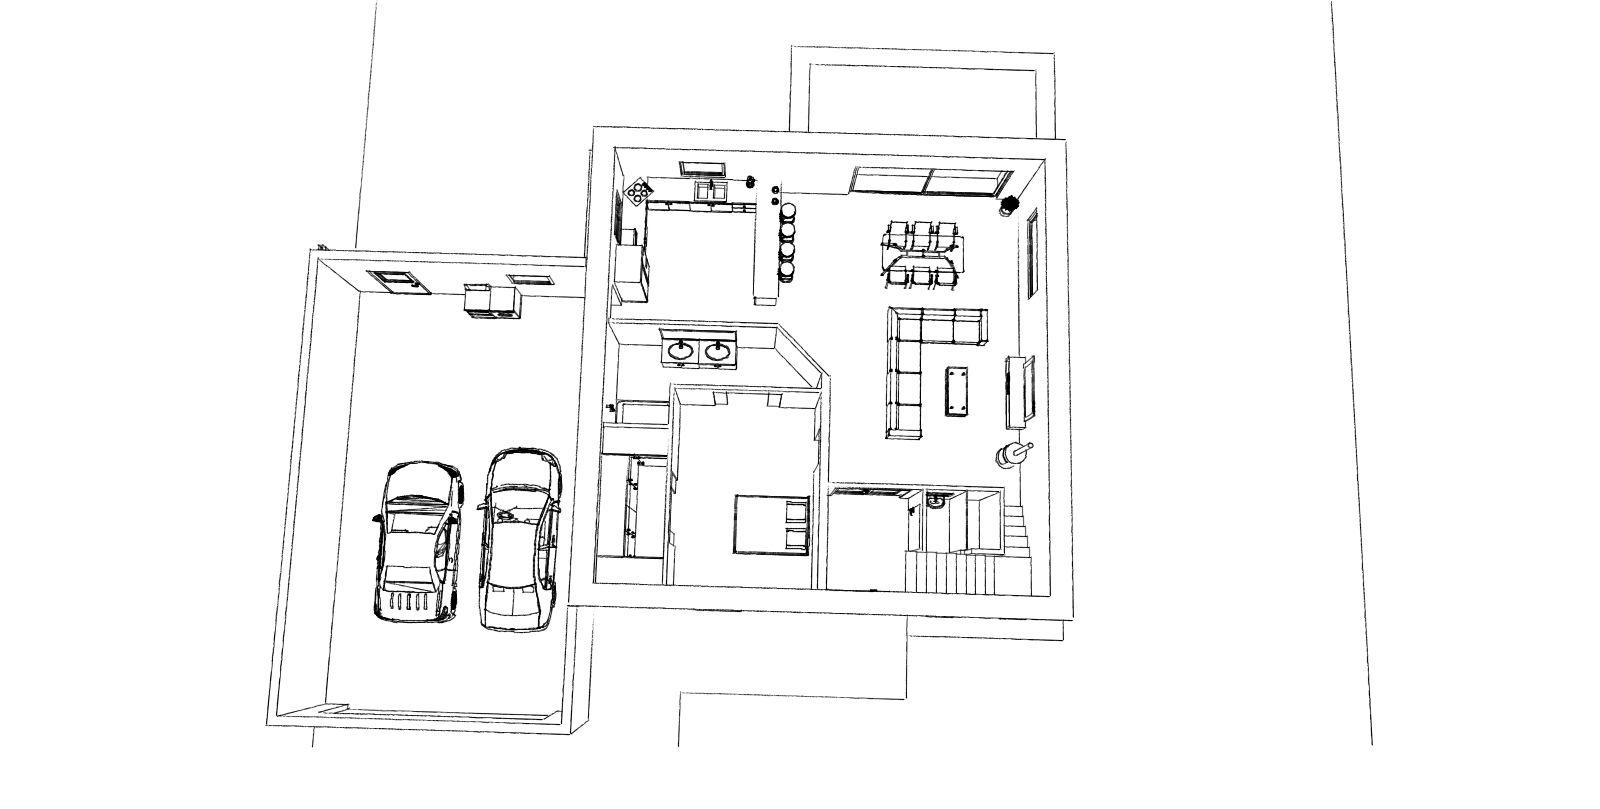 Faire construire sa maison au black maison moderne - Construire sa maison com plan ...